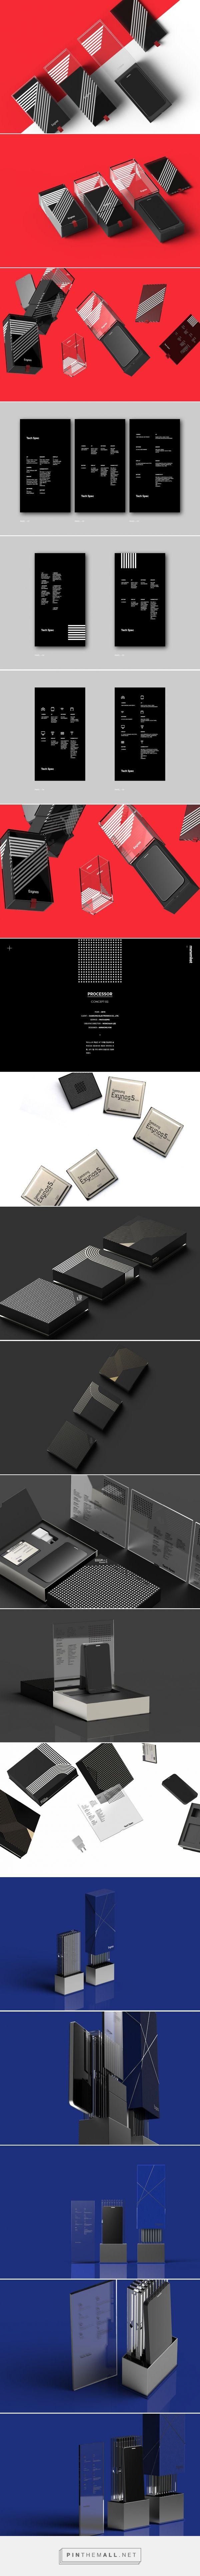 Samsung Exynos Packaging #Design by minimalist (Korea) - http://www.packagingoftheworld.com/2016/05/samsung-exynos-packaging.html